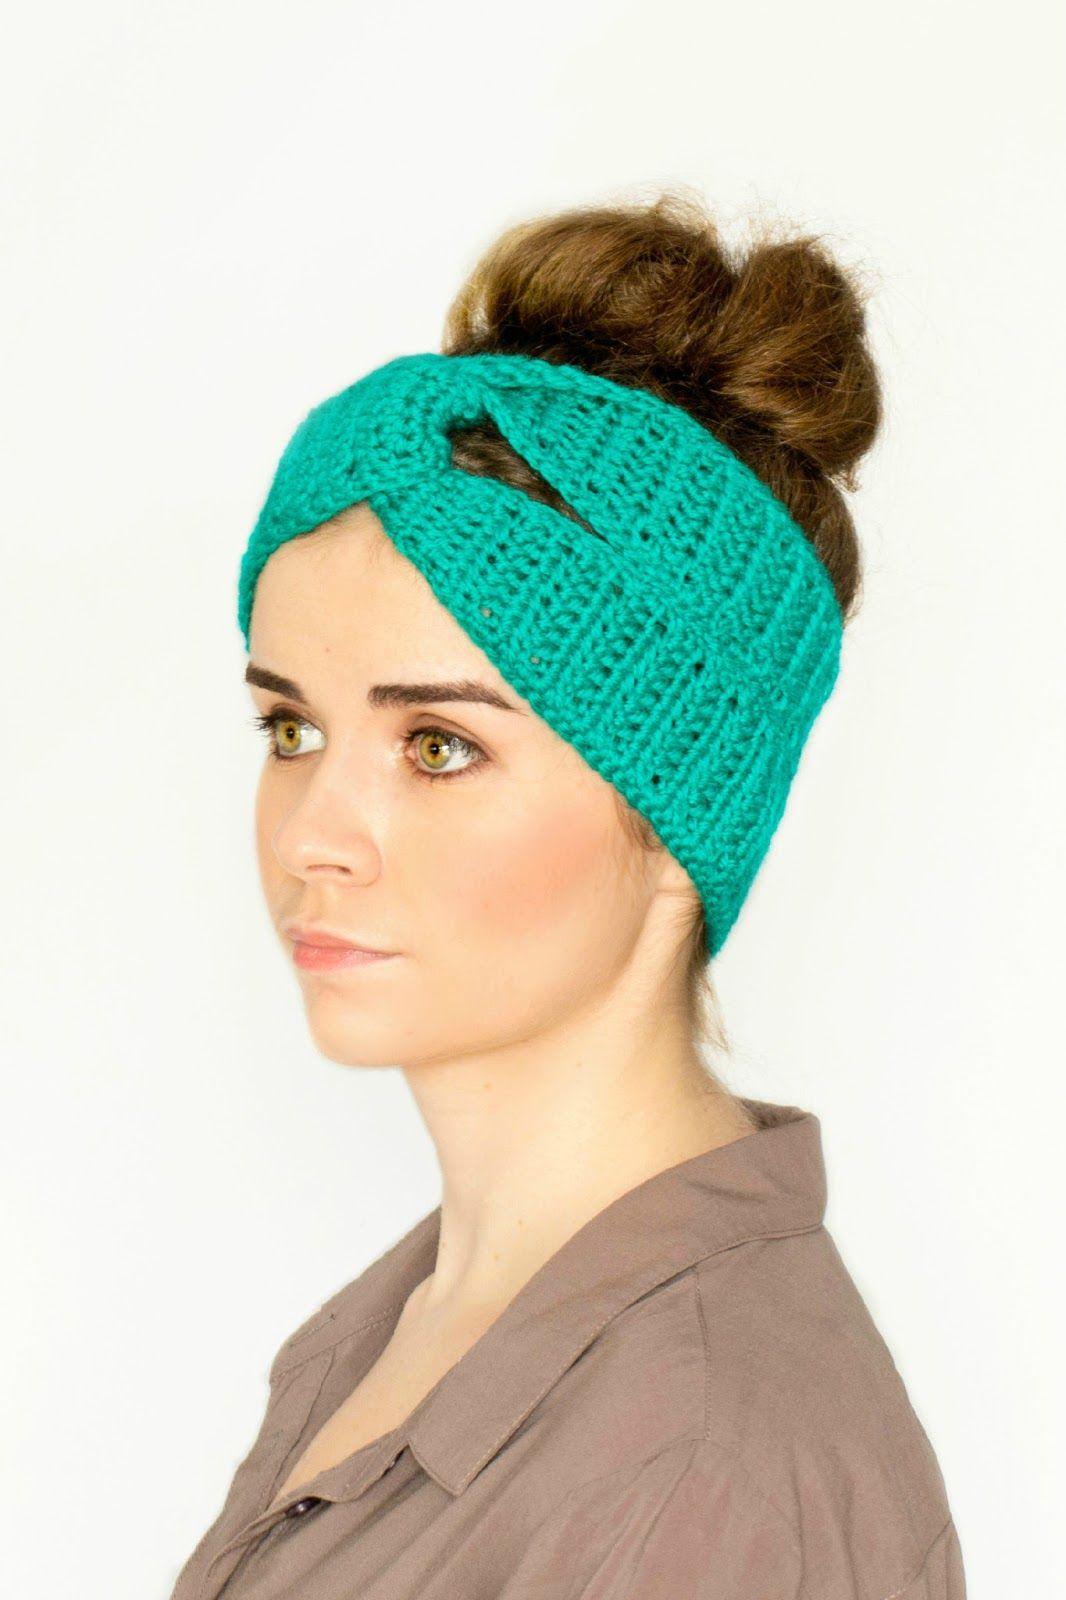 Twisted Turban Headband Crochet Pattern   Girly stuff crochet ...